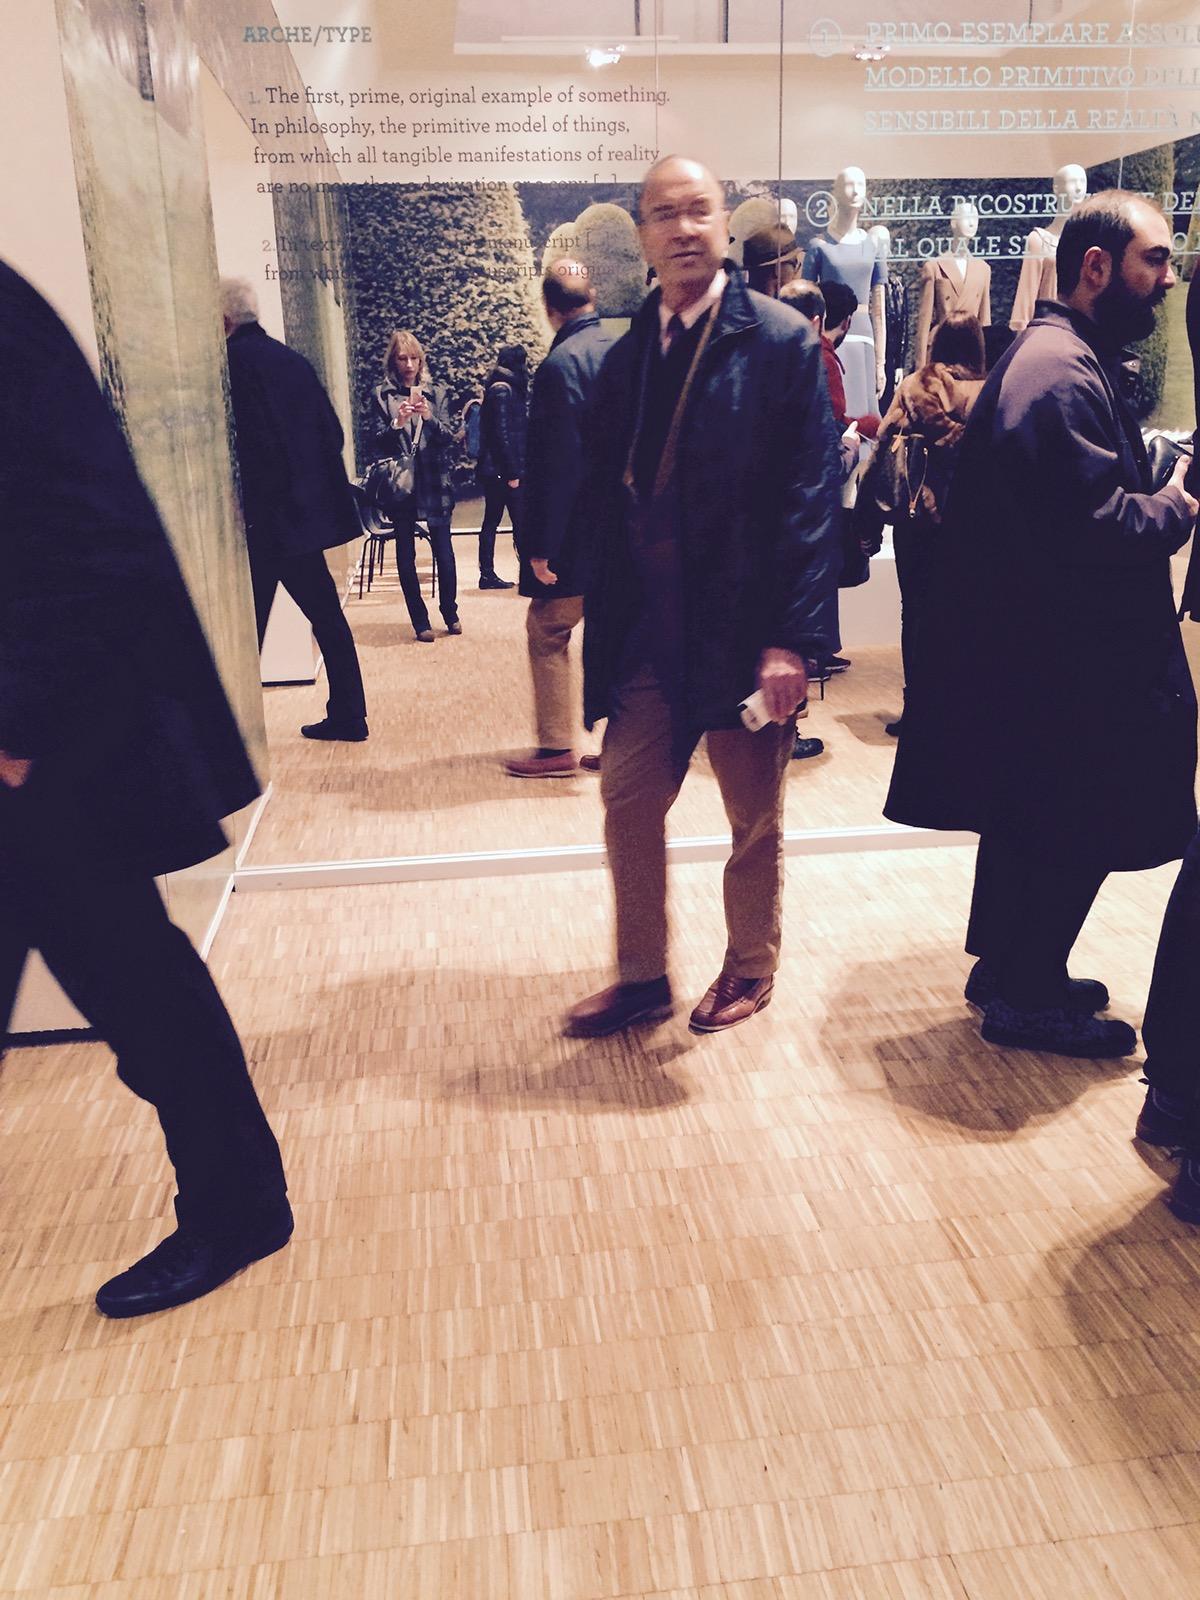 milan,fashion illustration,Exhibition ,museum,italian,vernissage,postcards,Open Toe Illustration